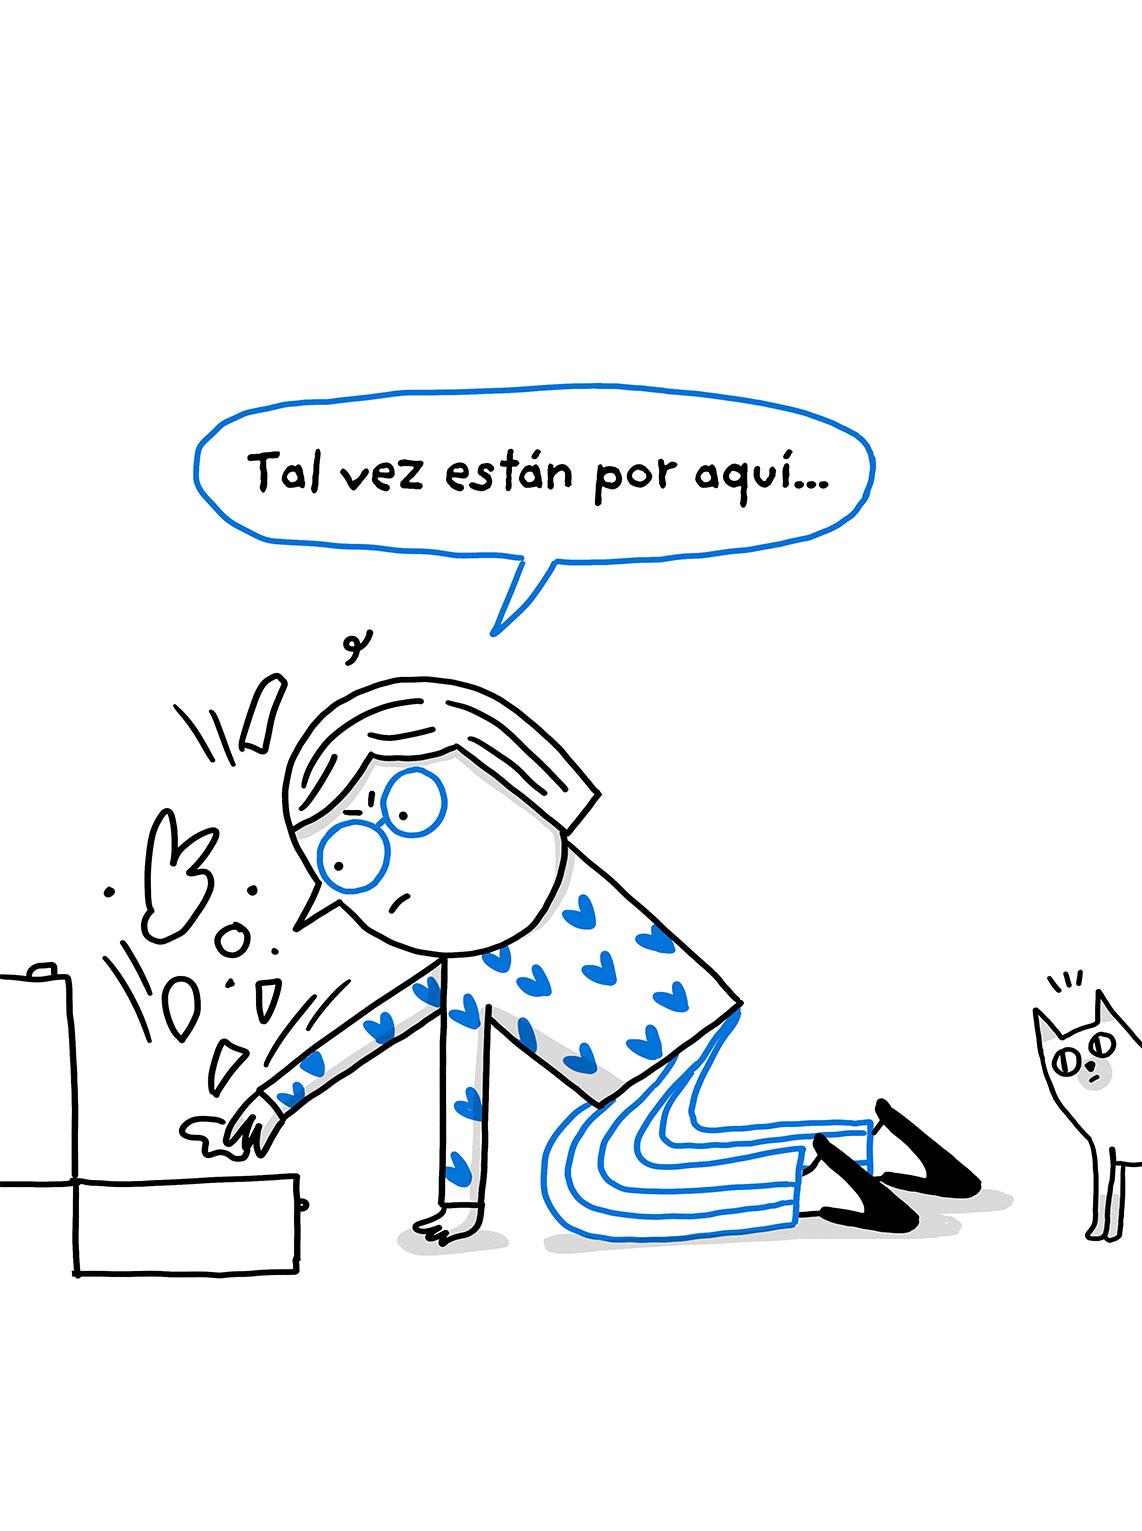 diariocorona_juliasolans17